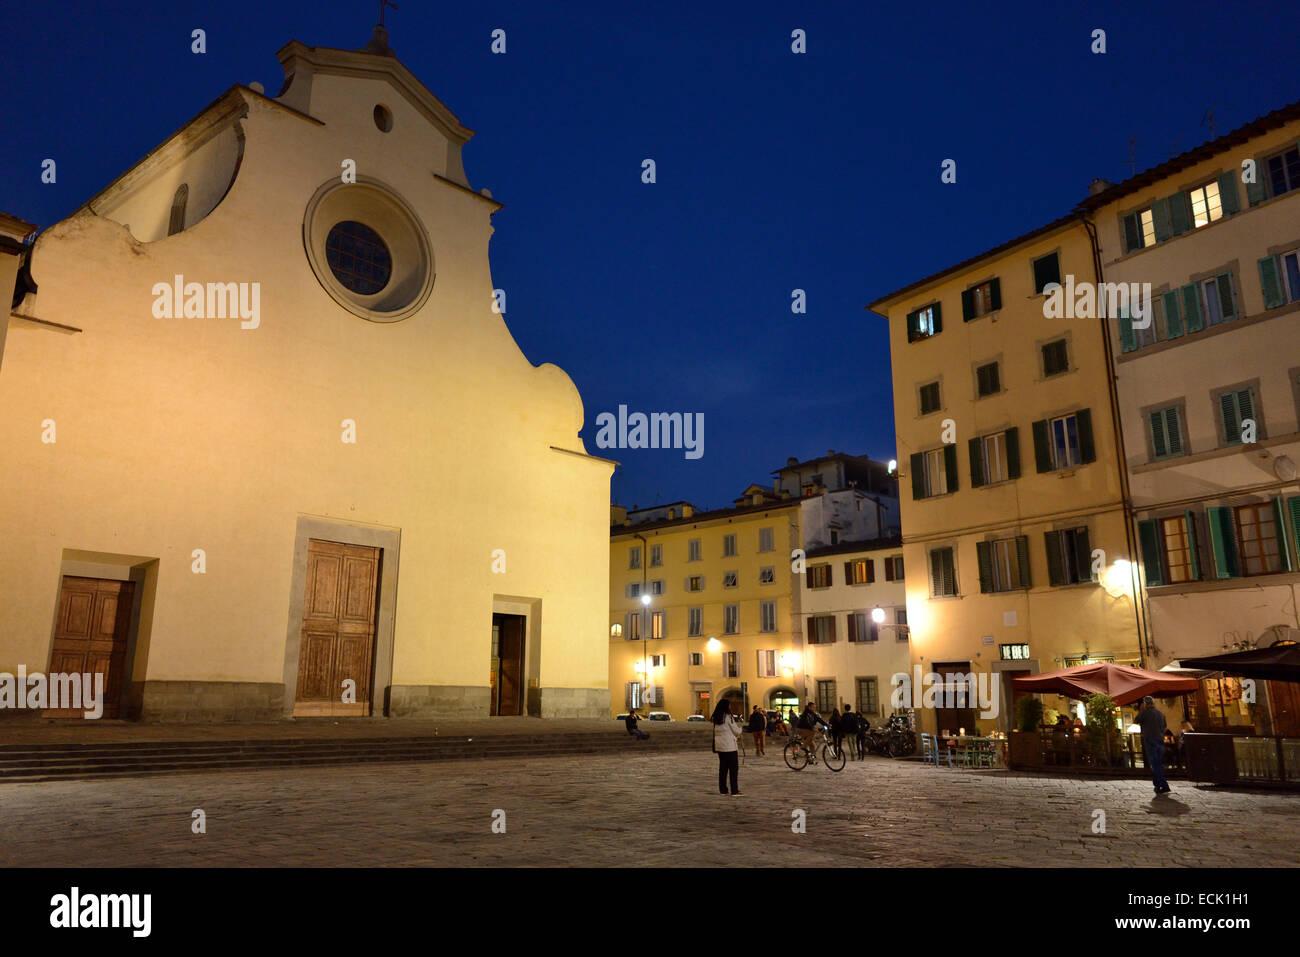 Florence. Italy. Basilica Santo Spirito, Piazza Santo Spirito, Oltrarno quarter. Stock Photo